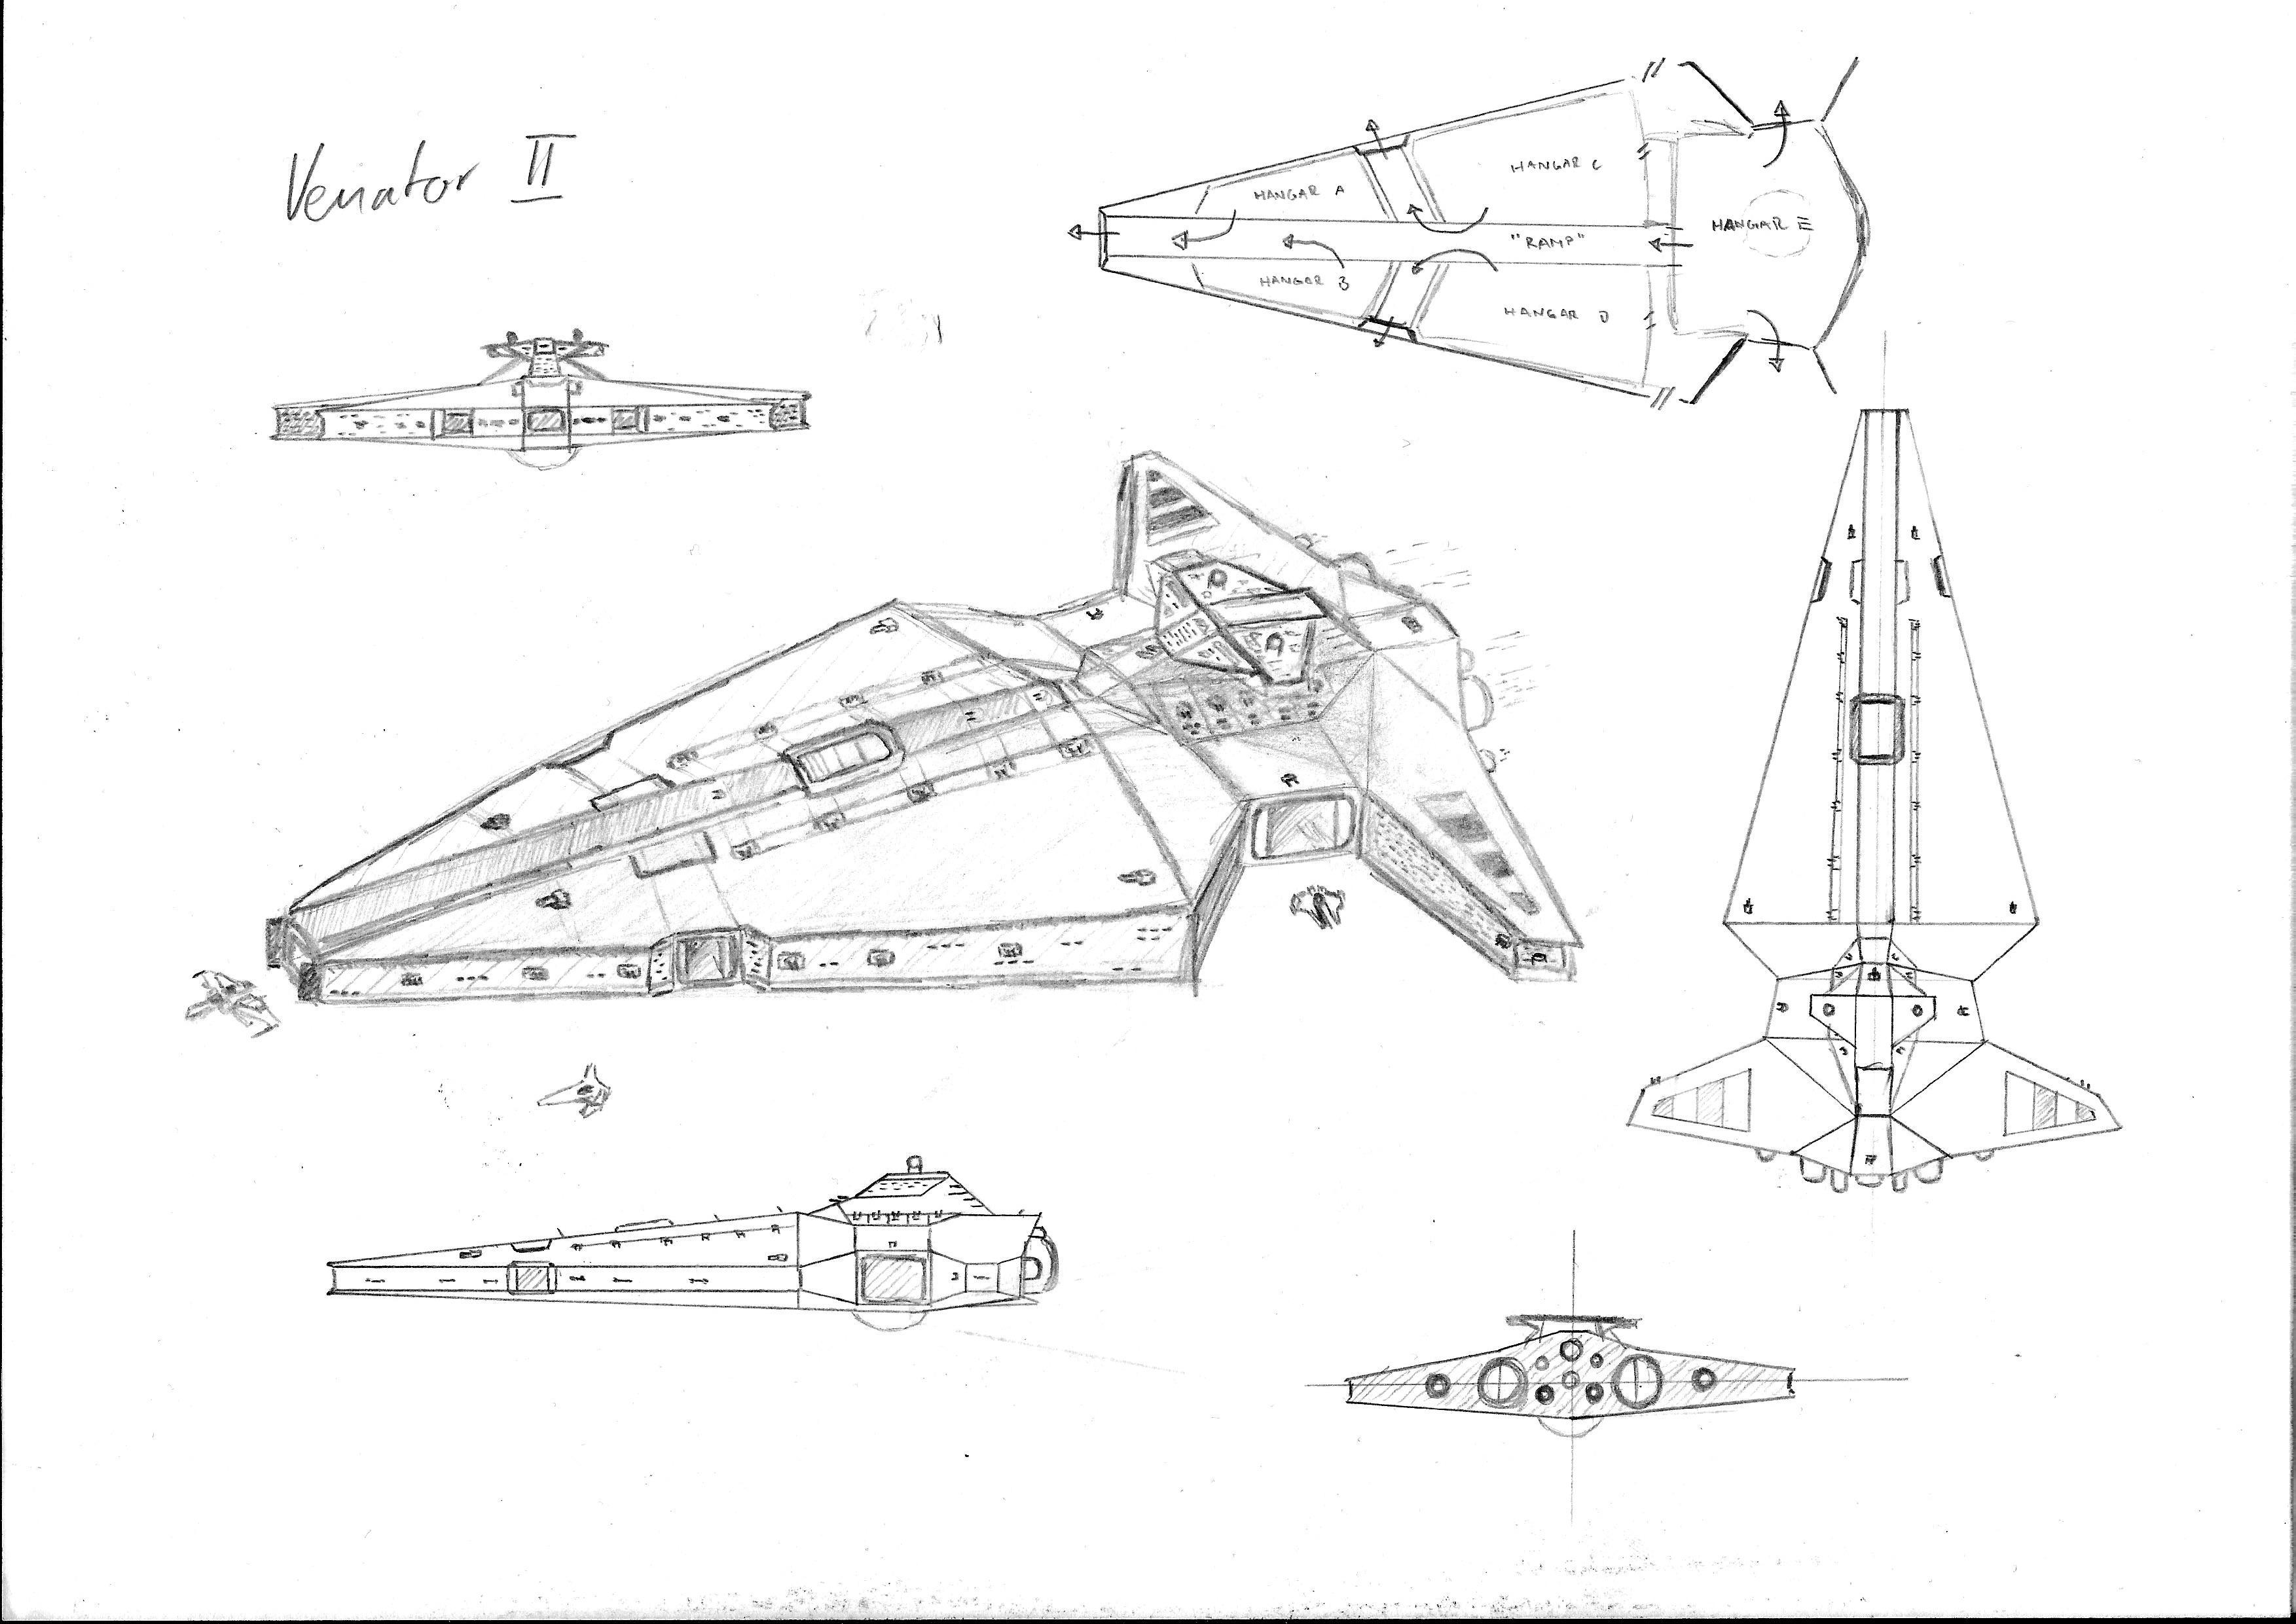 My 10 Min Sketch Proposal For A Venator Ii Class Star